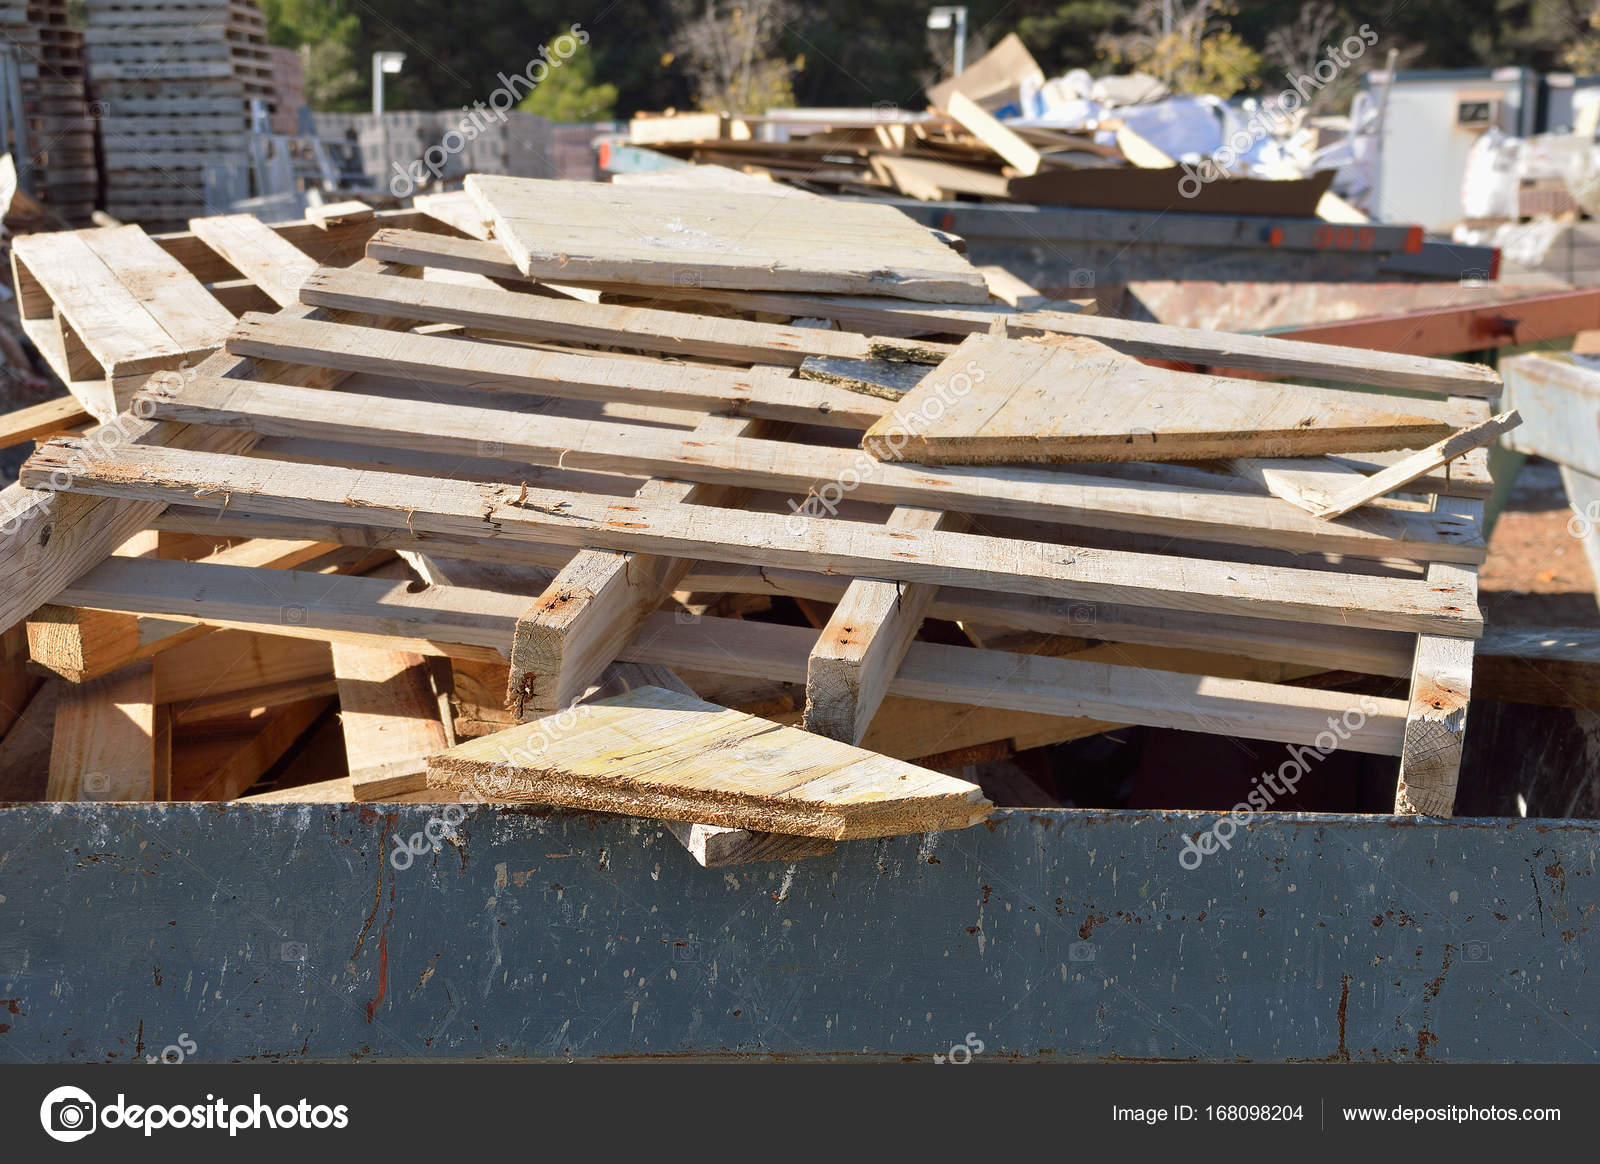 Reciclaje palets madera el palet para reciclar with reciclaje palets madera best reciclado de - Reciclaje de palets de madera ...